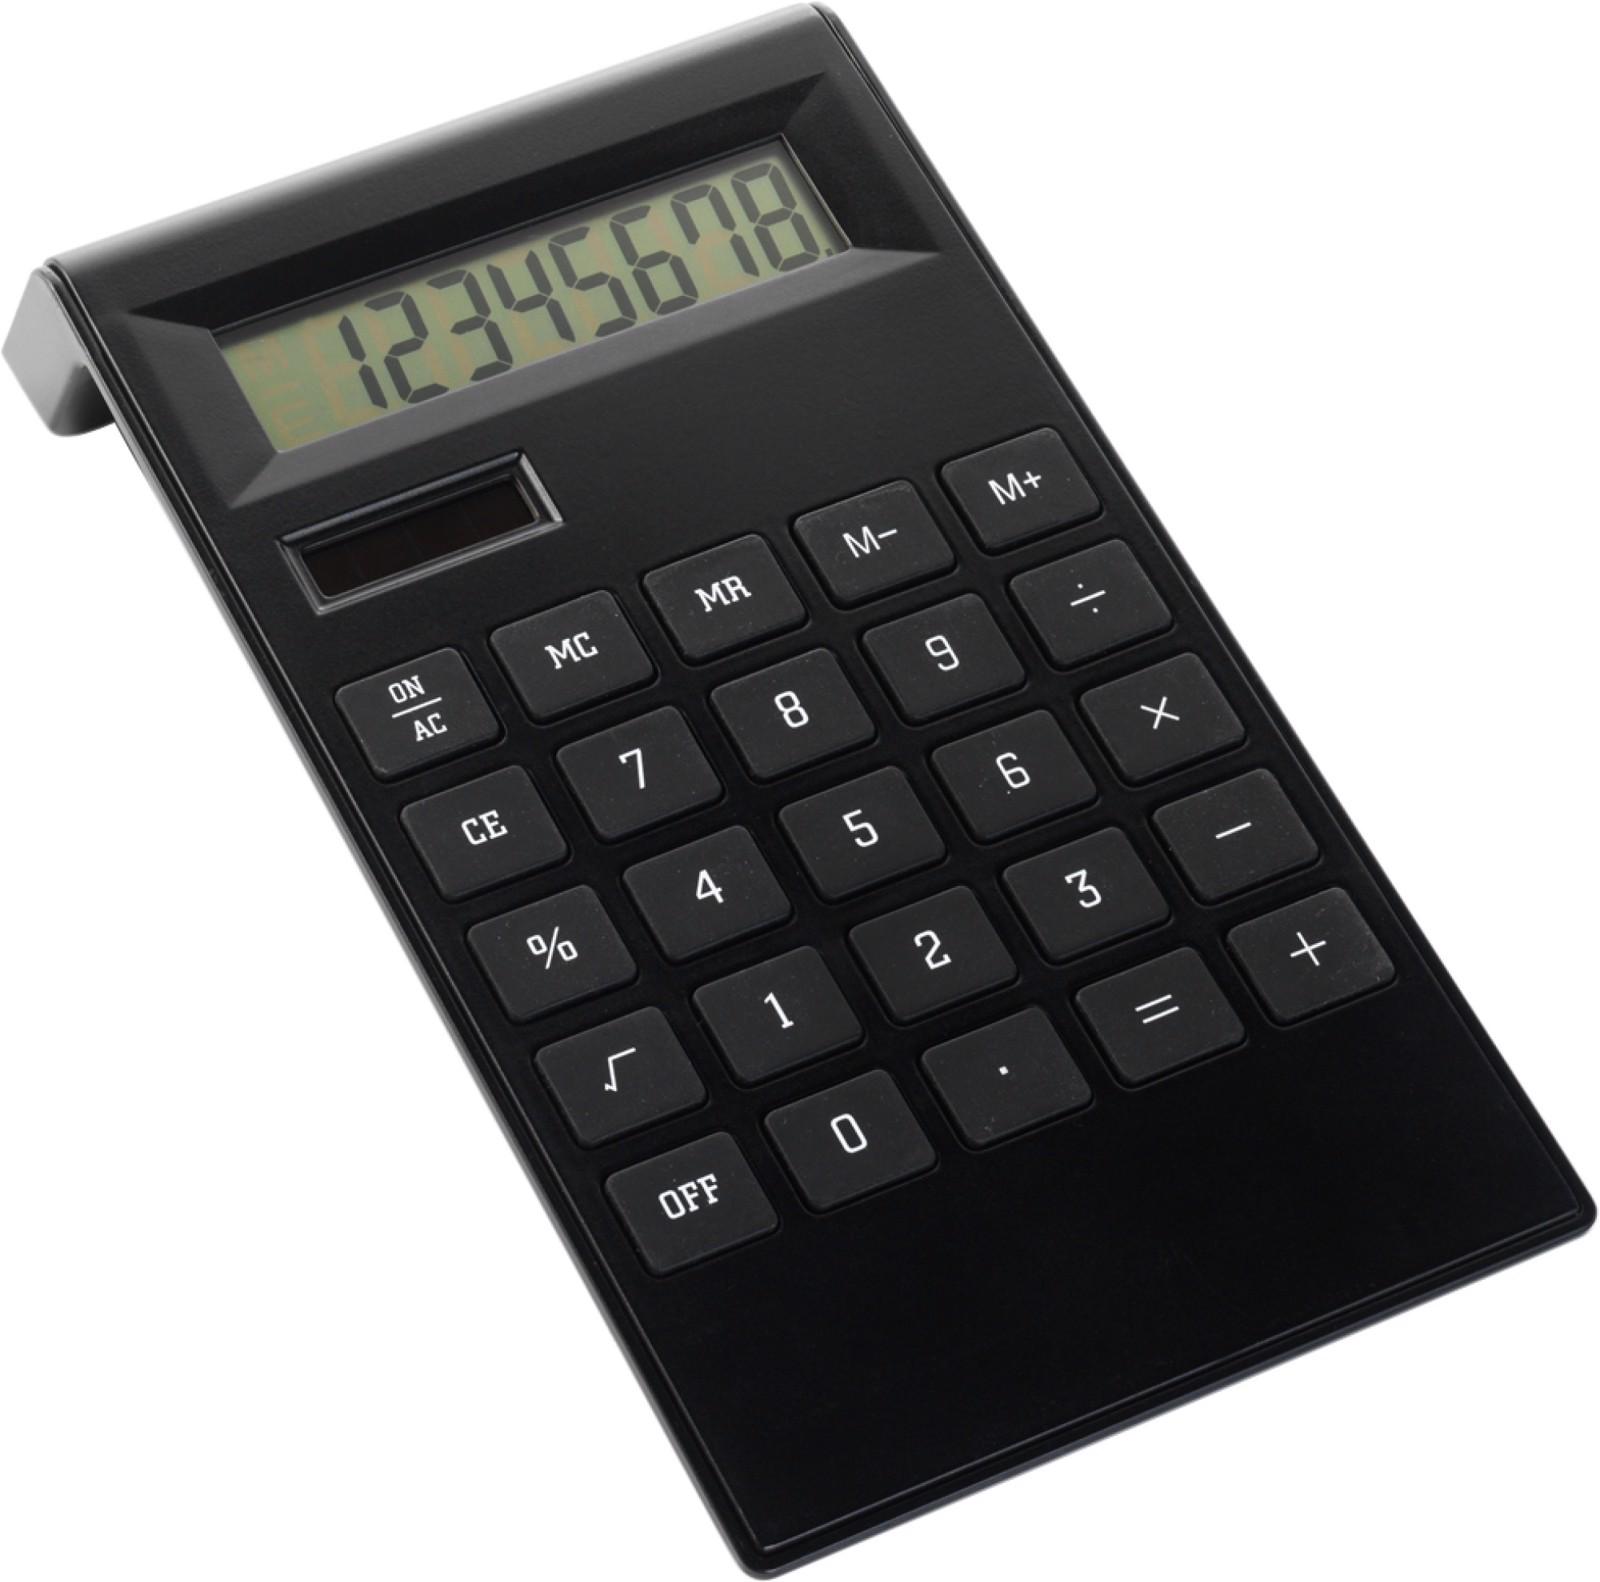 ABS calculator - Black